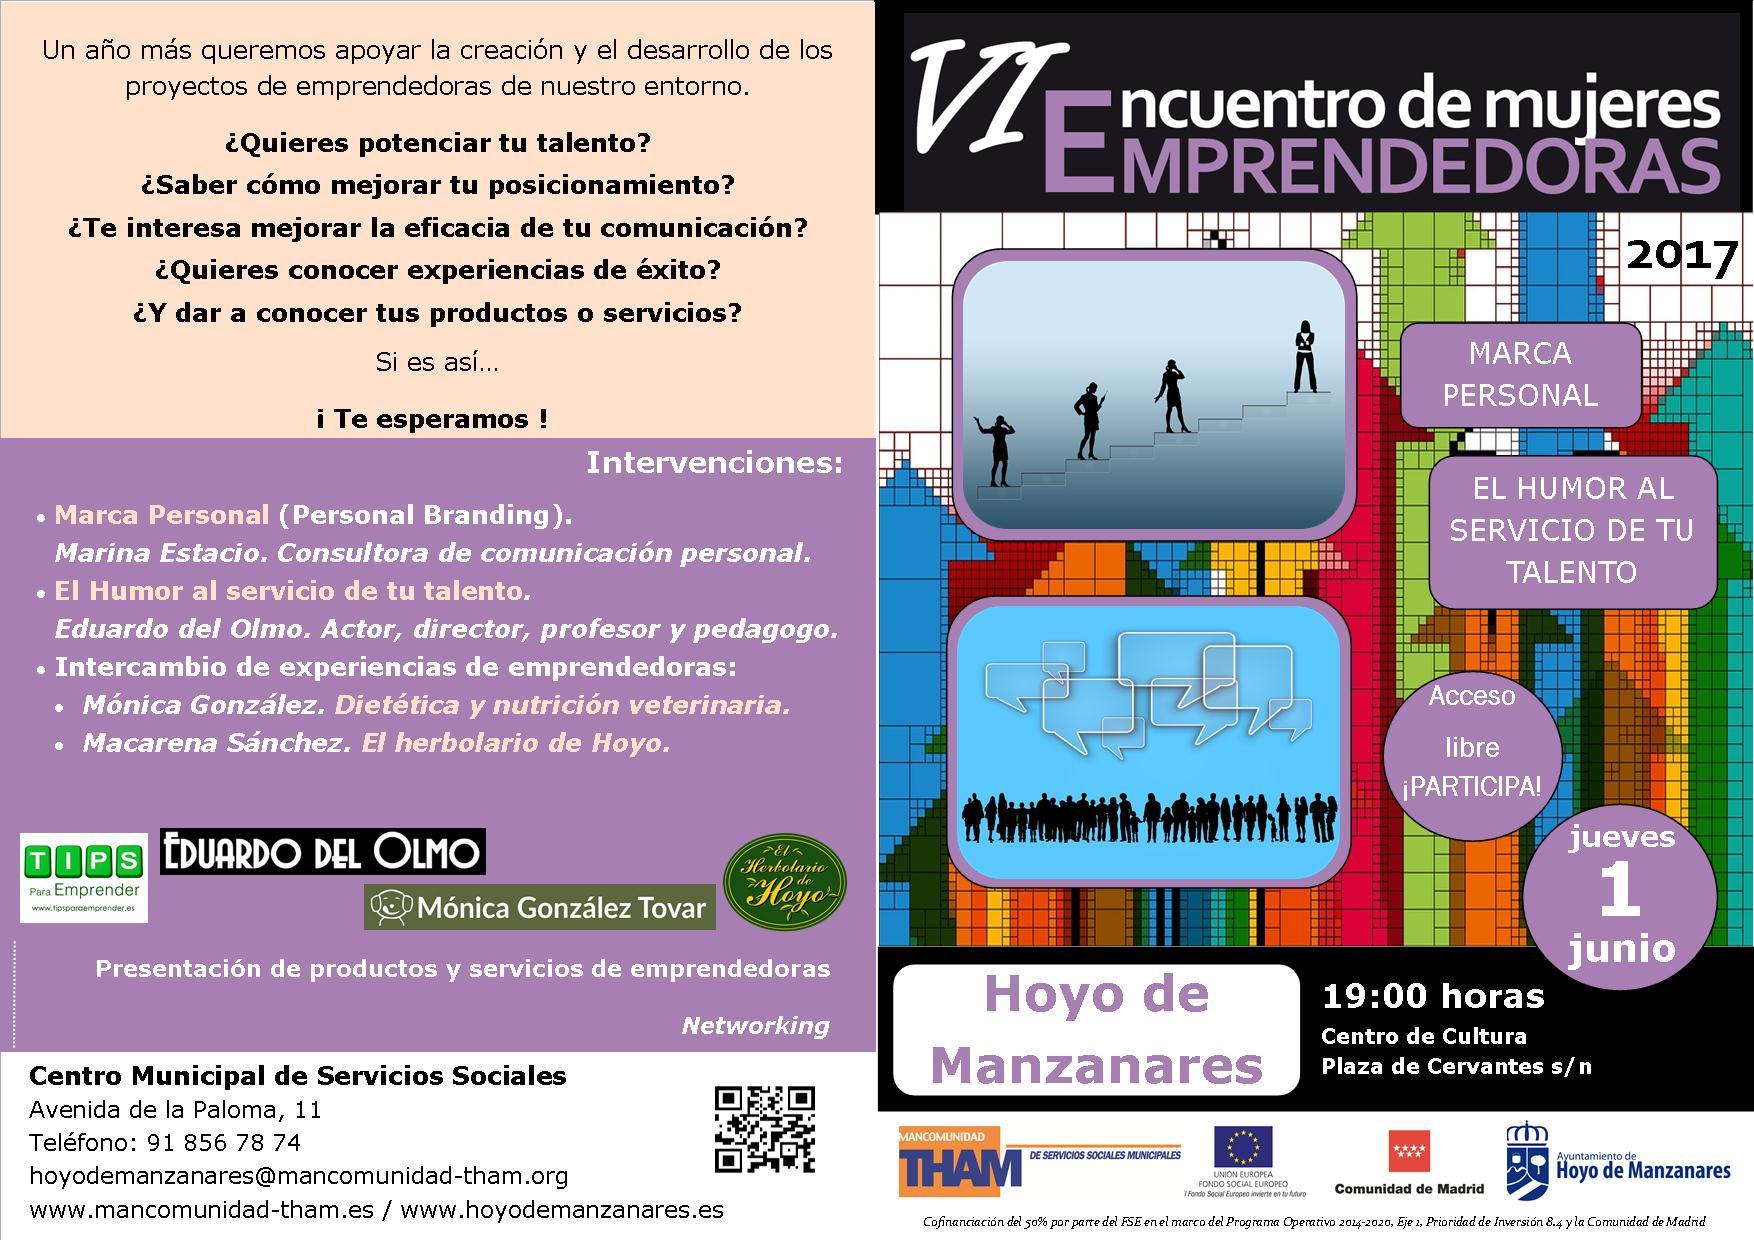 Cartel Mujeres Emprendedoras A5 en A4 - Hoyo de Manzanares